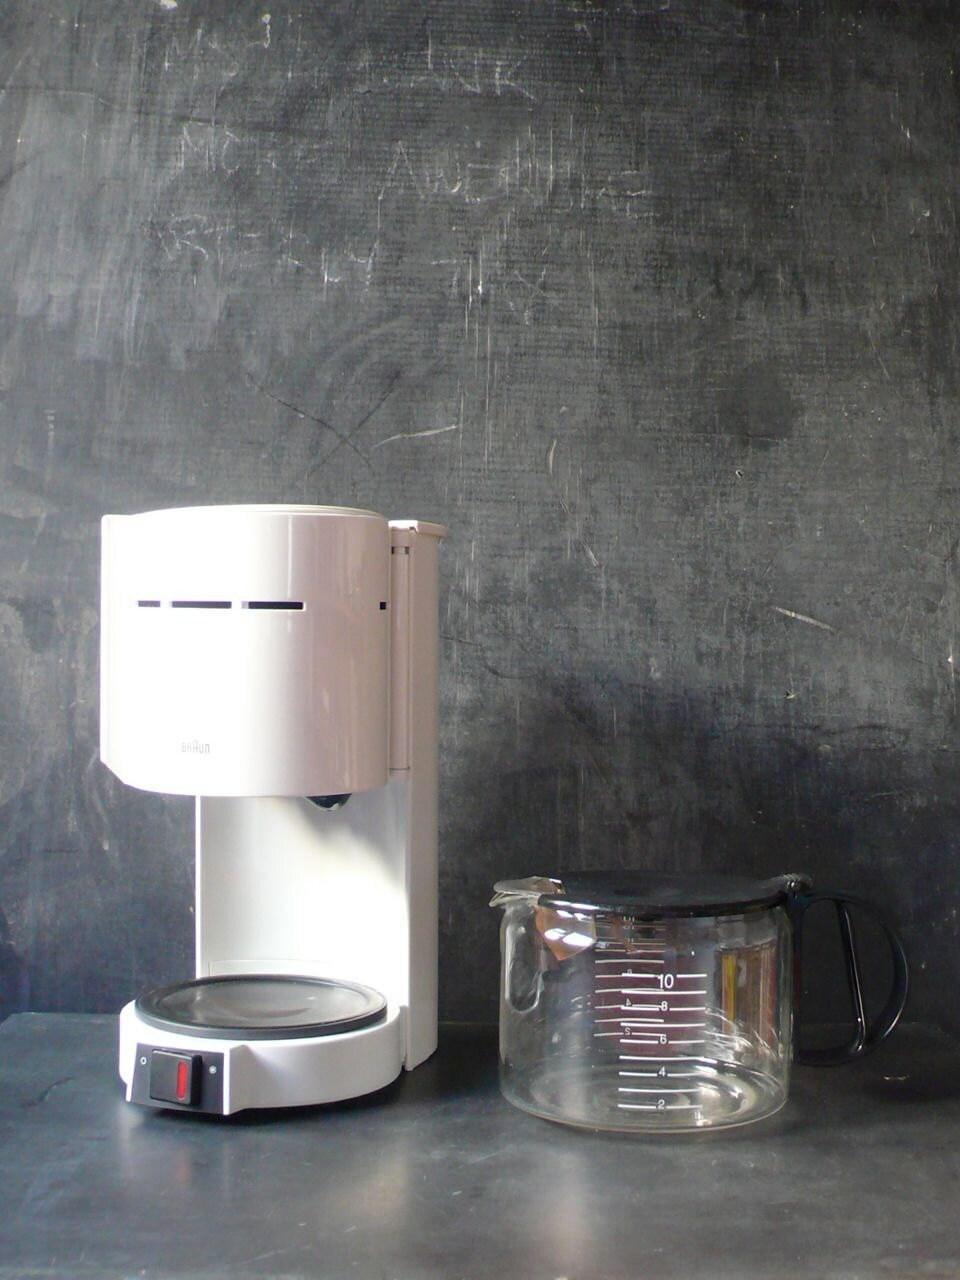 Vintage Braun Coffee maker and matching Coffee grinder.